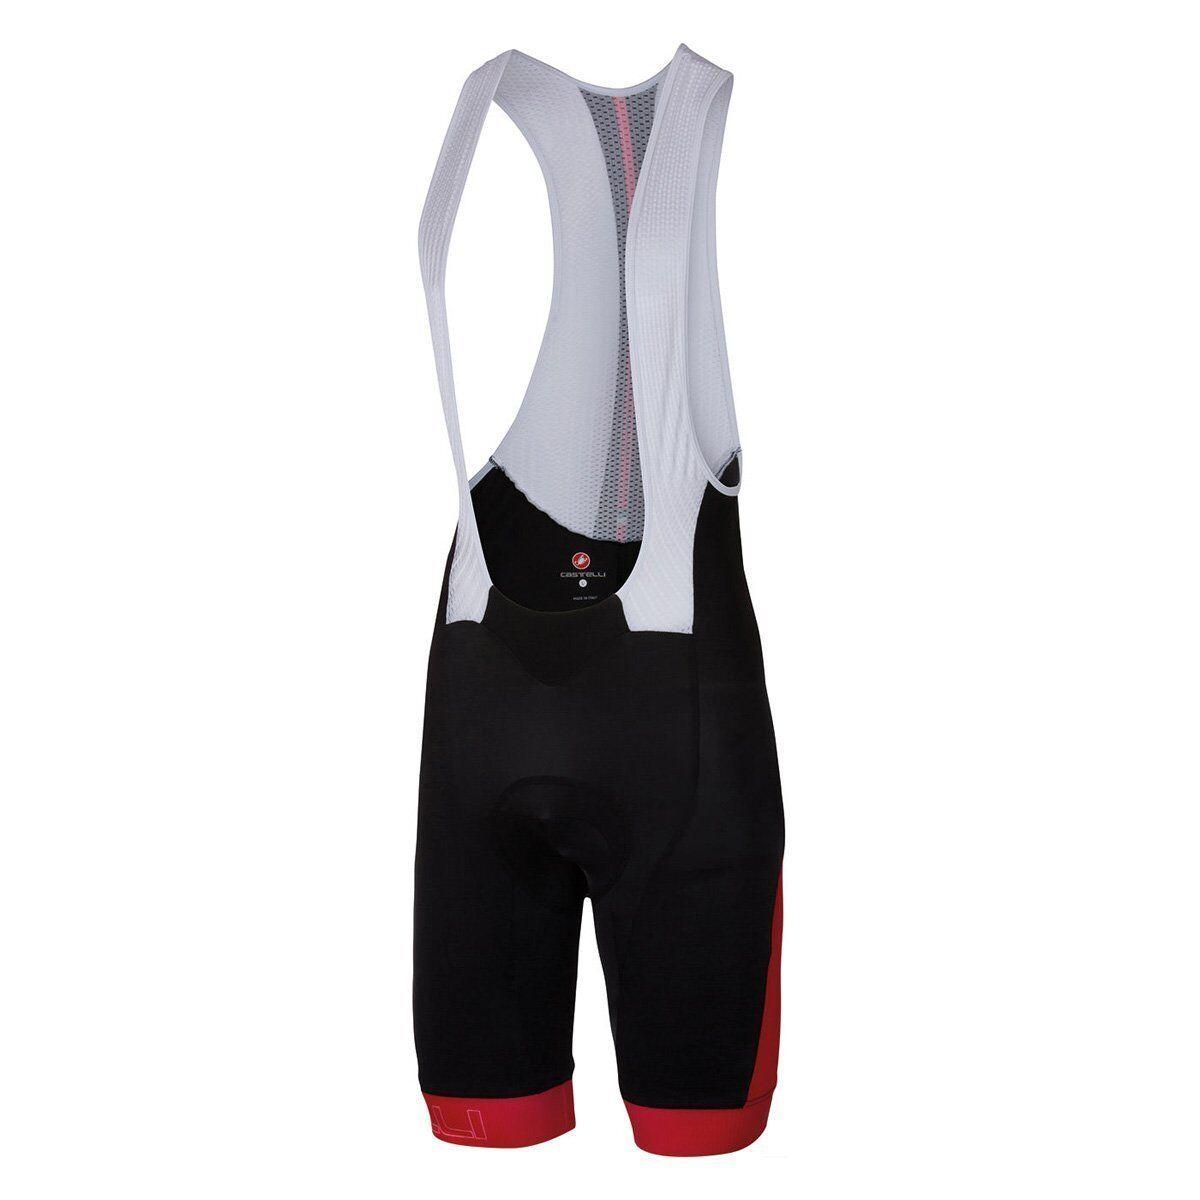 Castelli Velocissimo Pantalones cortos para hombre - 2018